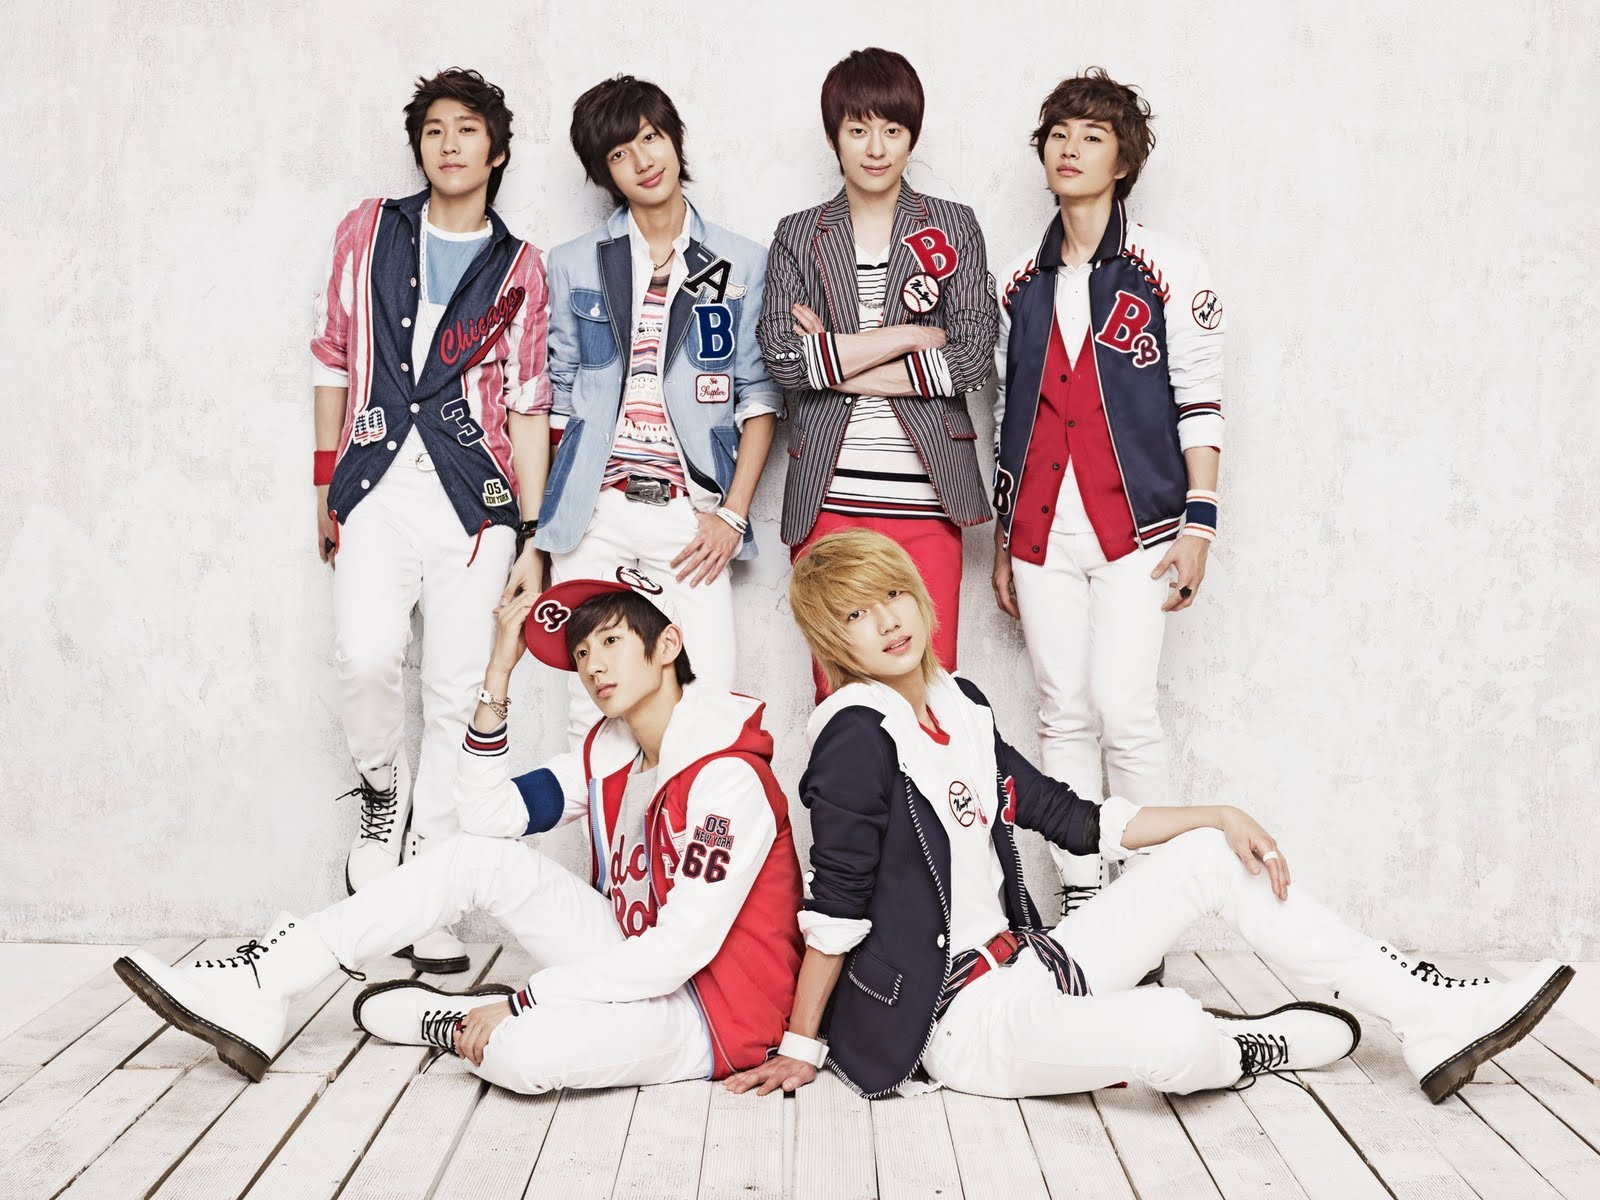 133-1331496_bf-boyfriend-kpop